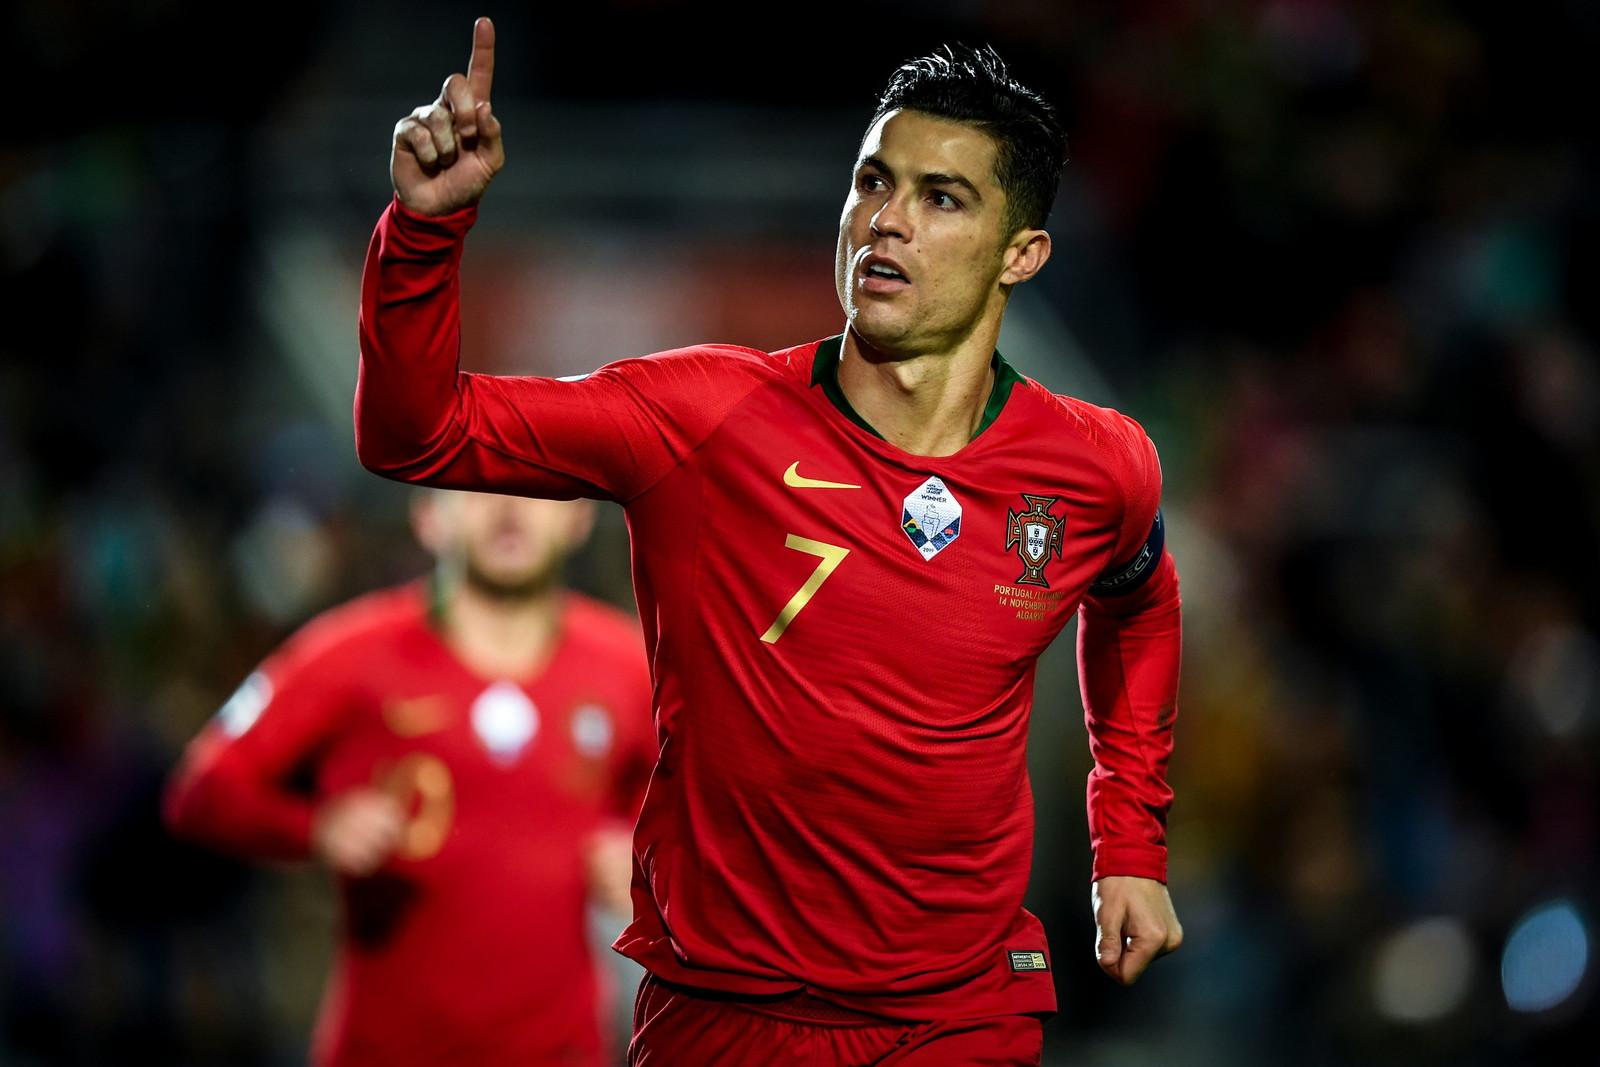 Qualificazioni Euro 2020, i risultati: a valanga Portogallo e Inghilterra